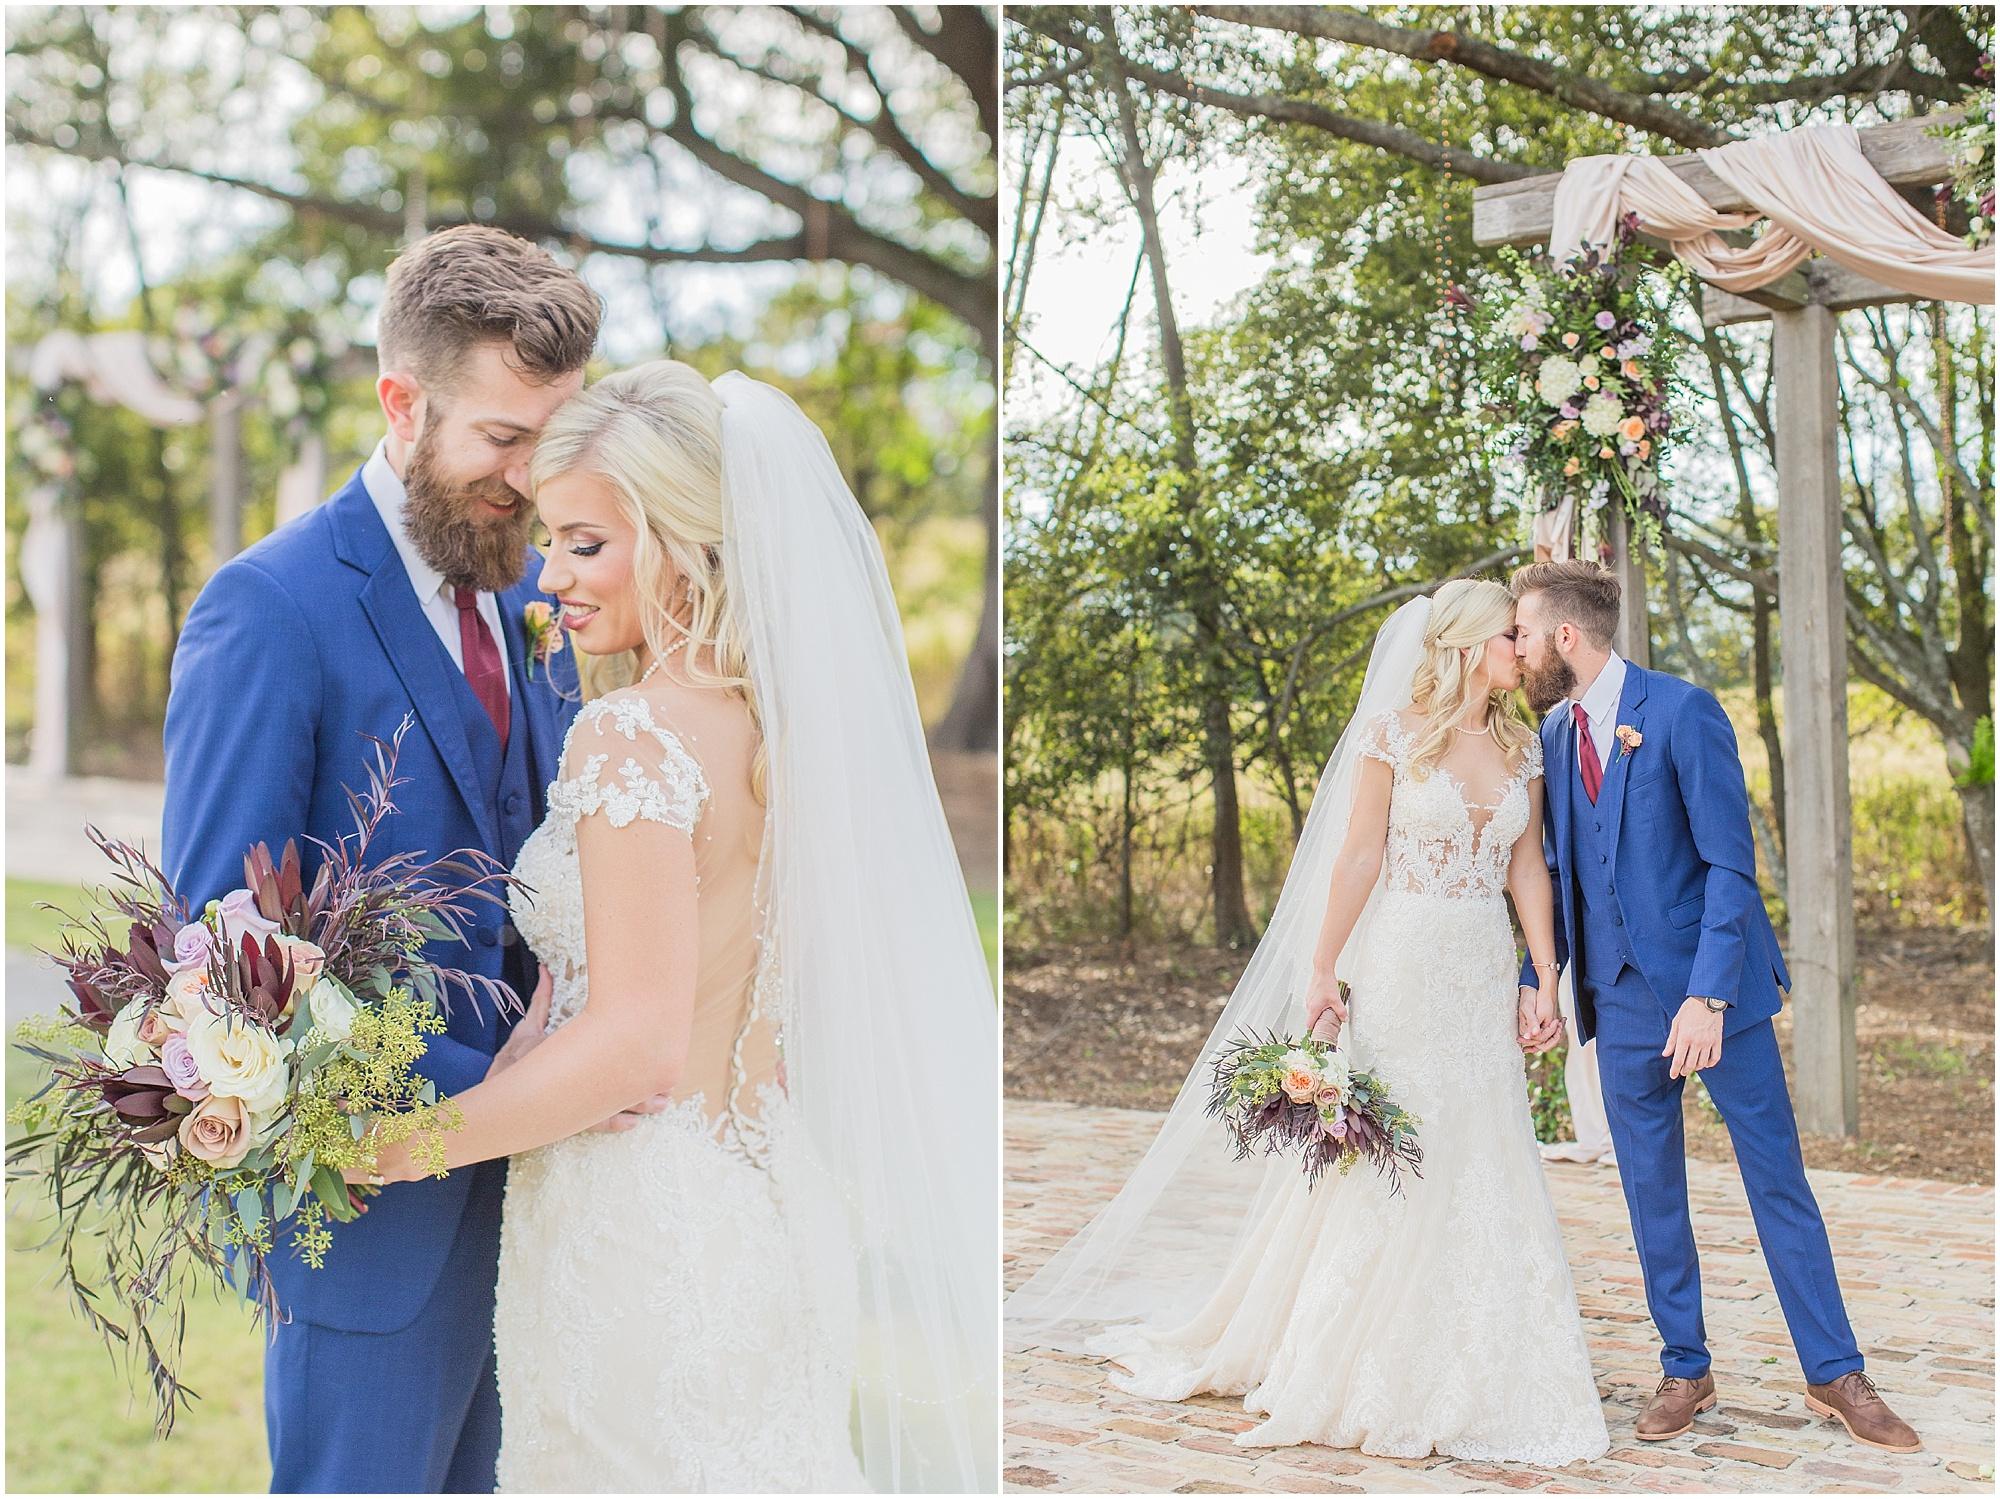 fall-wedding-bridlewood-of-madison-mississippi_0027.jpg